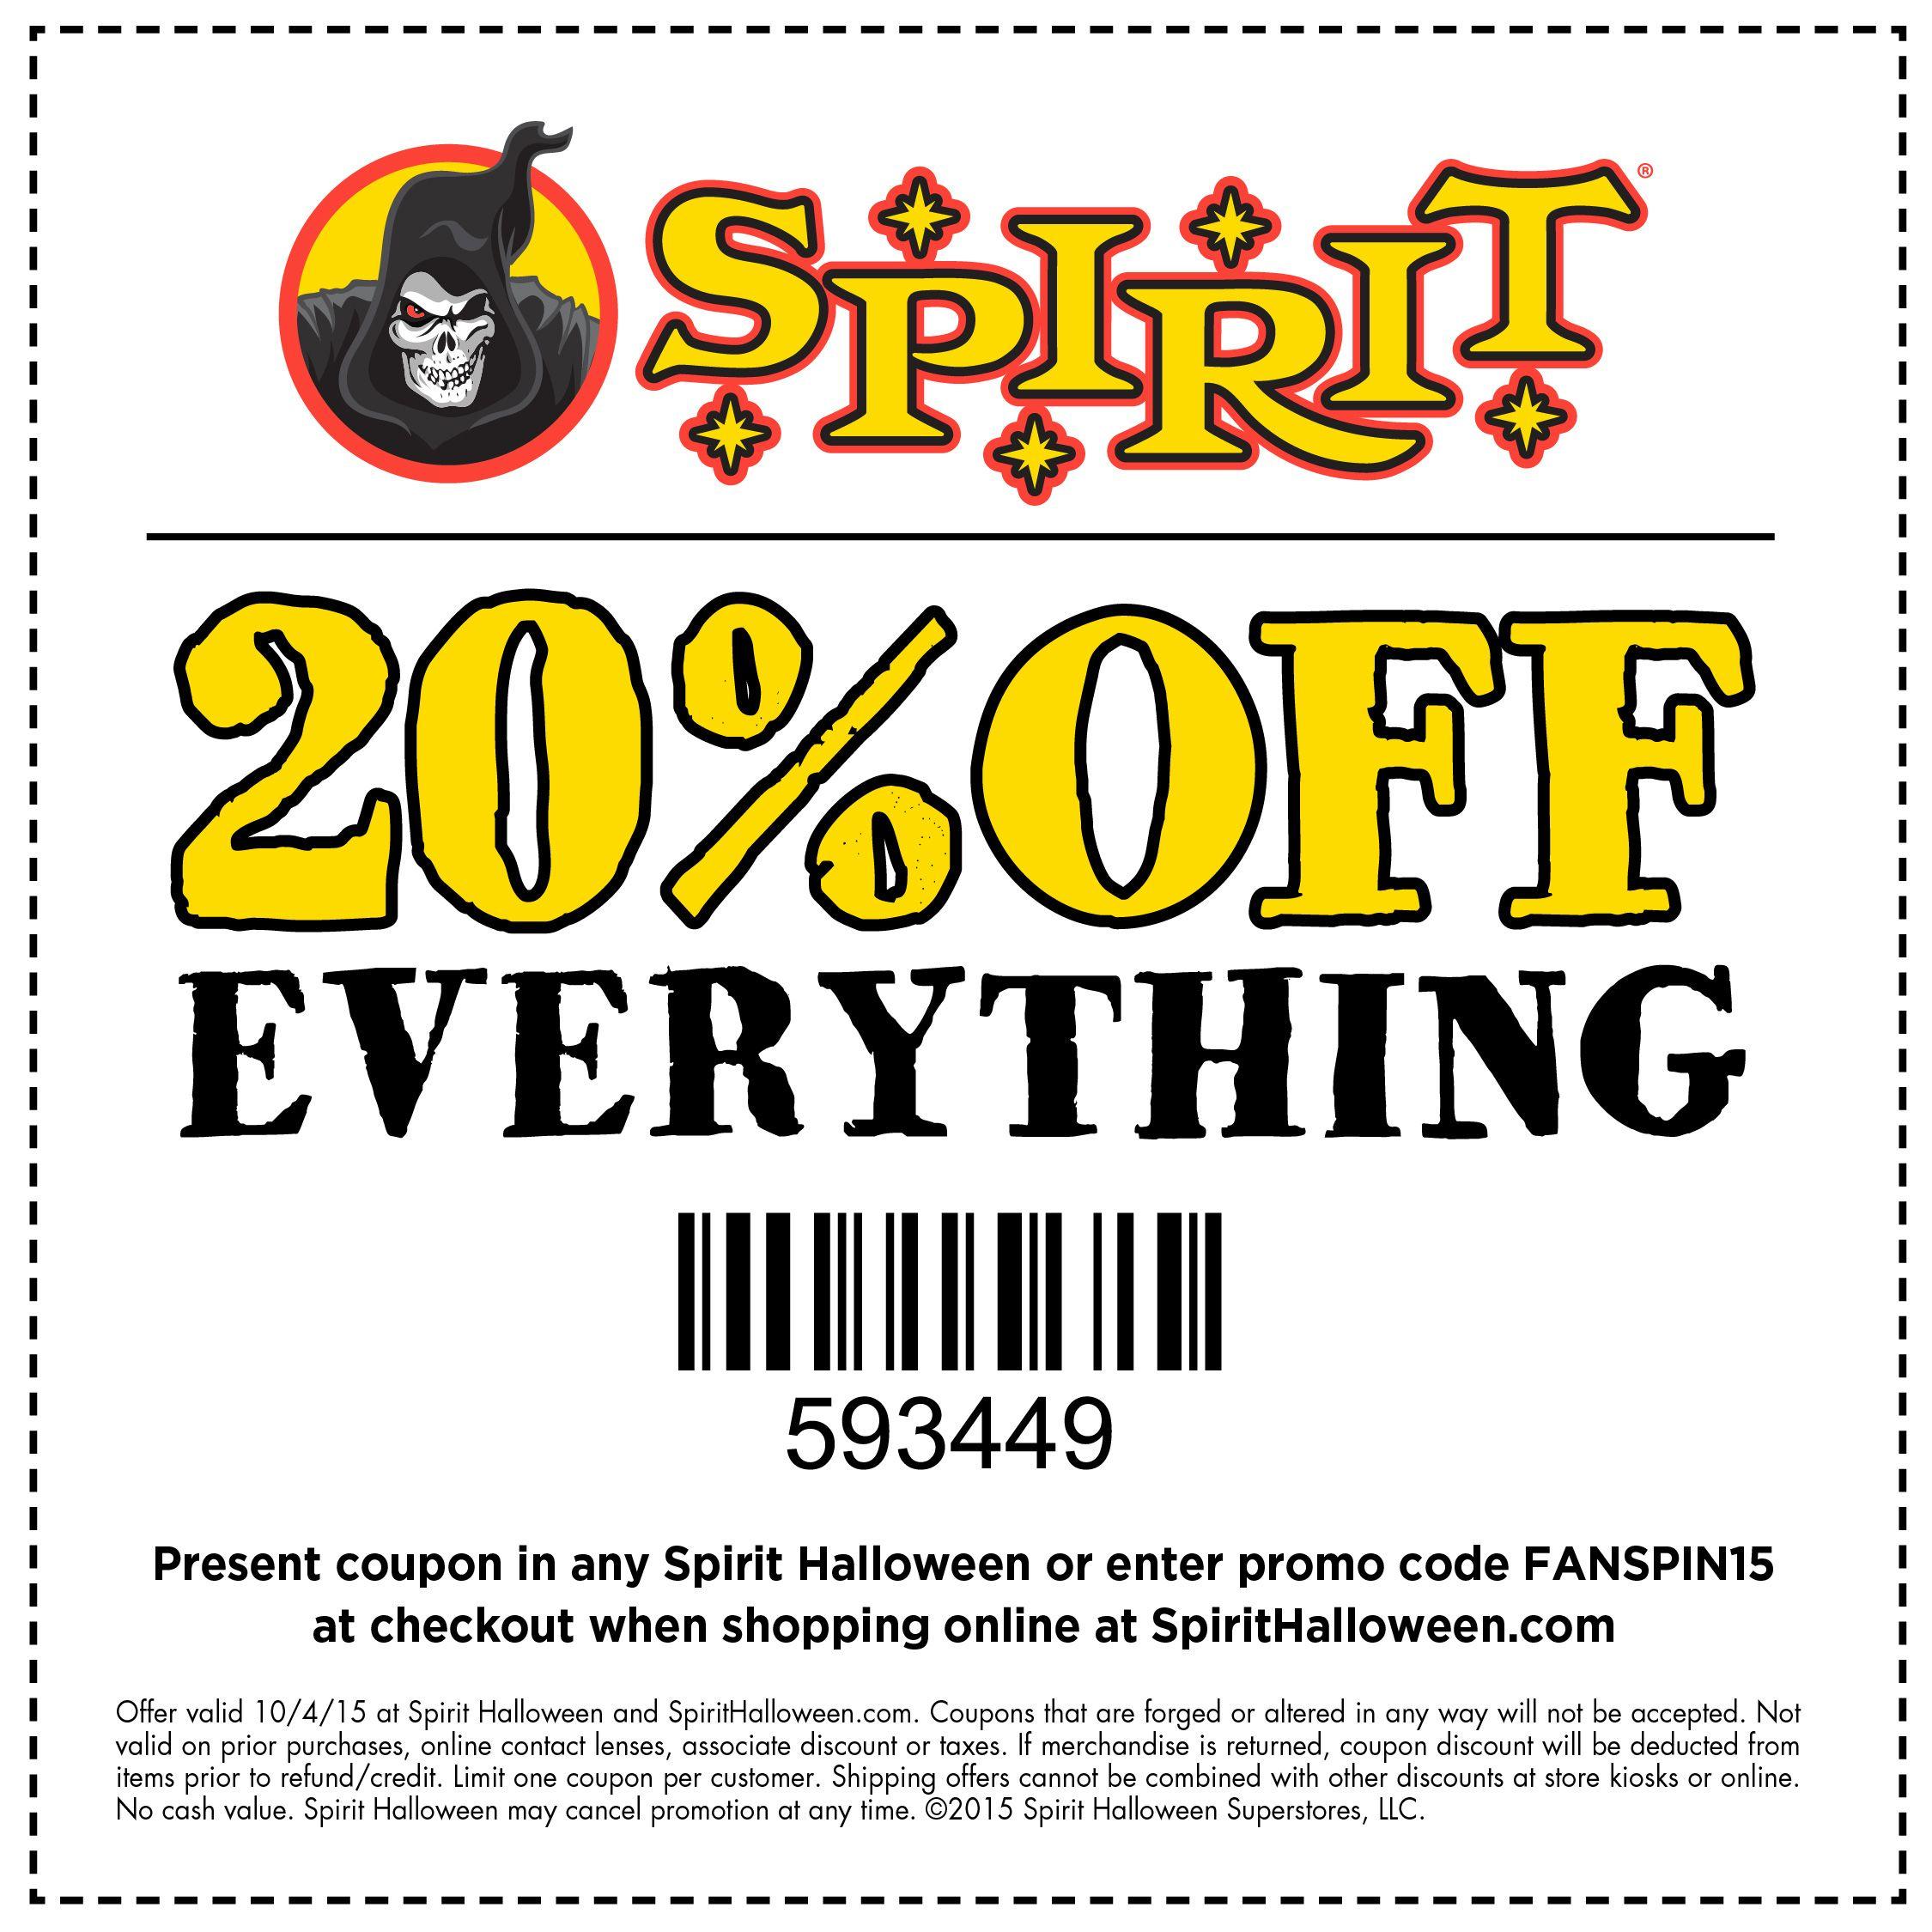 Spirt Of Halloween Printable Ciupon 2020 Here's a terrifyingly terrific treat for Spirit Halloween fans